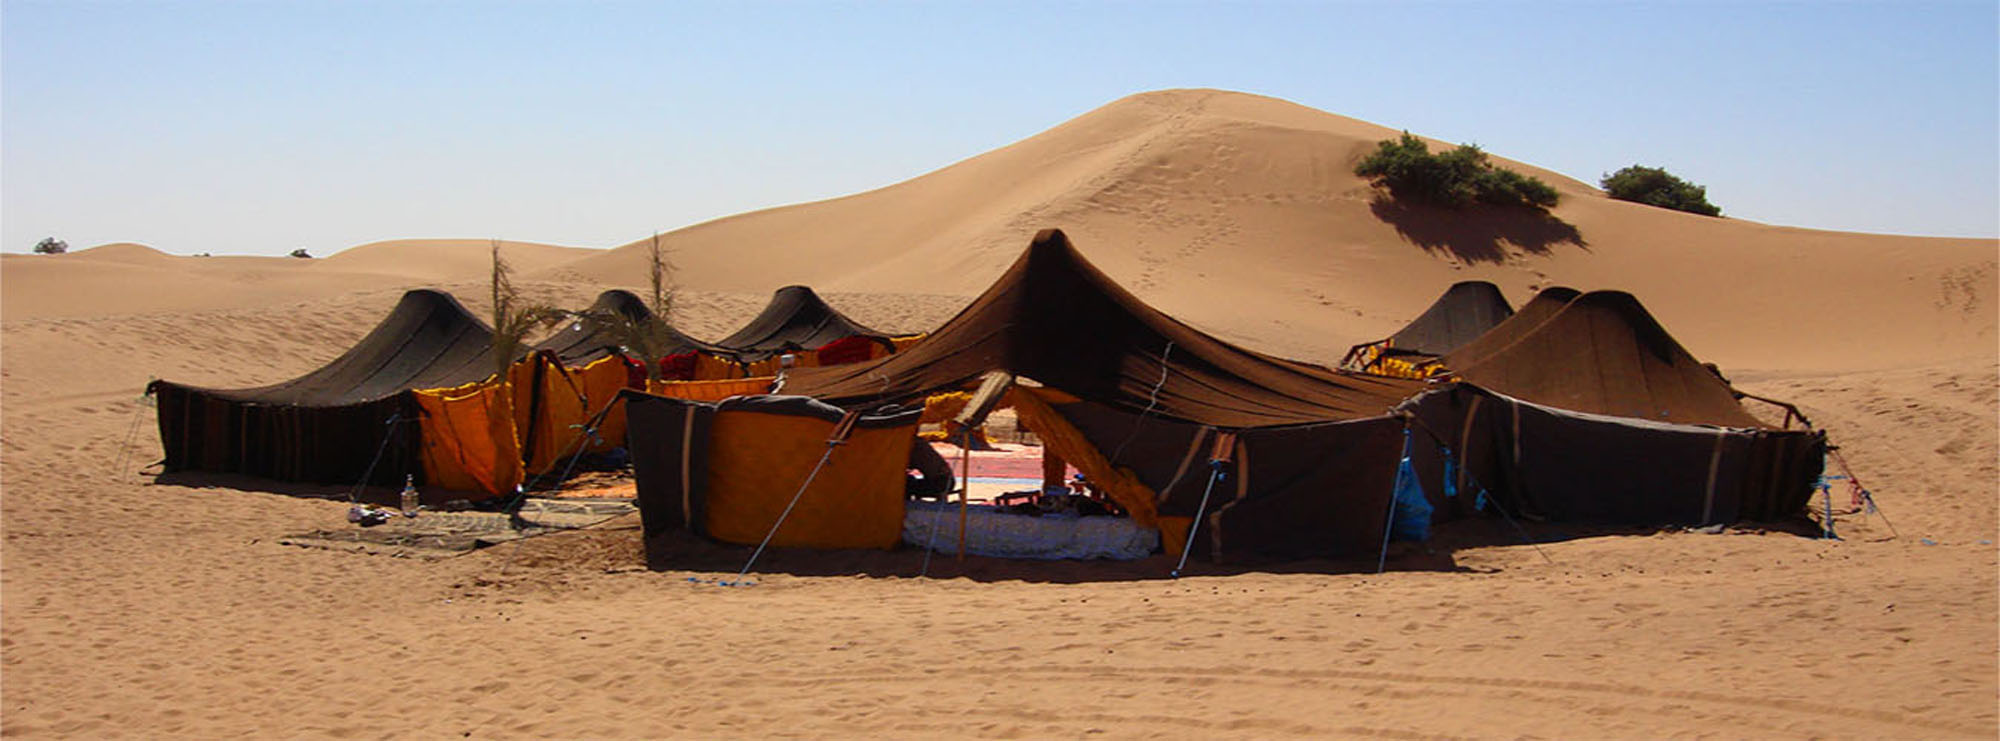 Camp standar-Marruecos